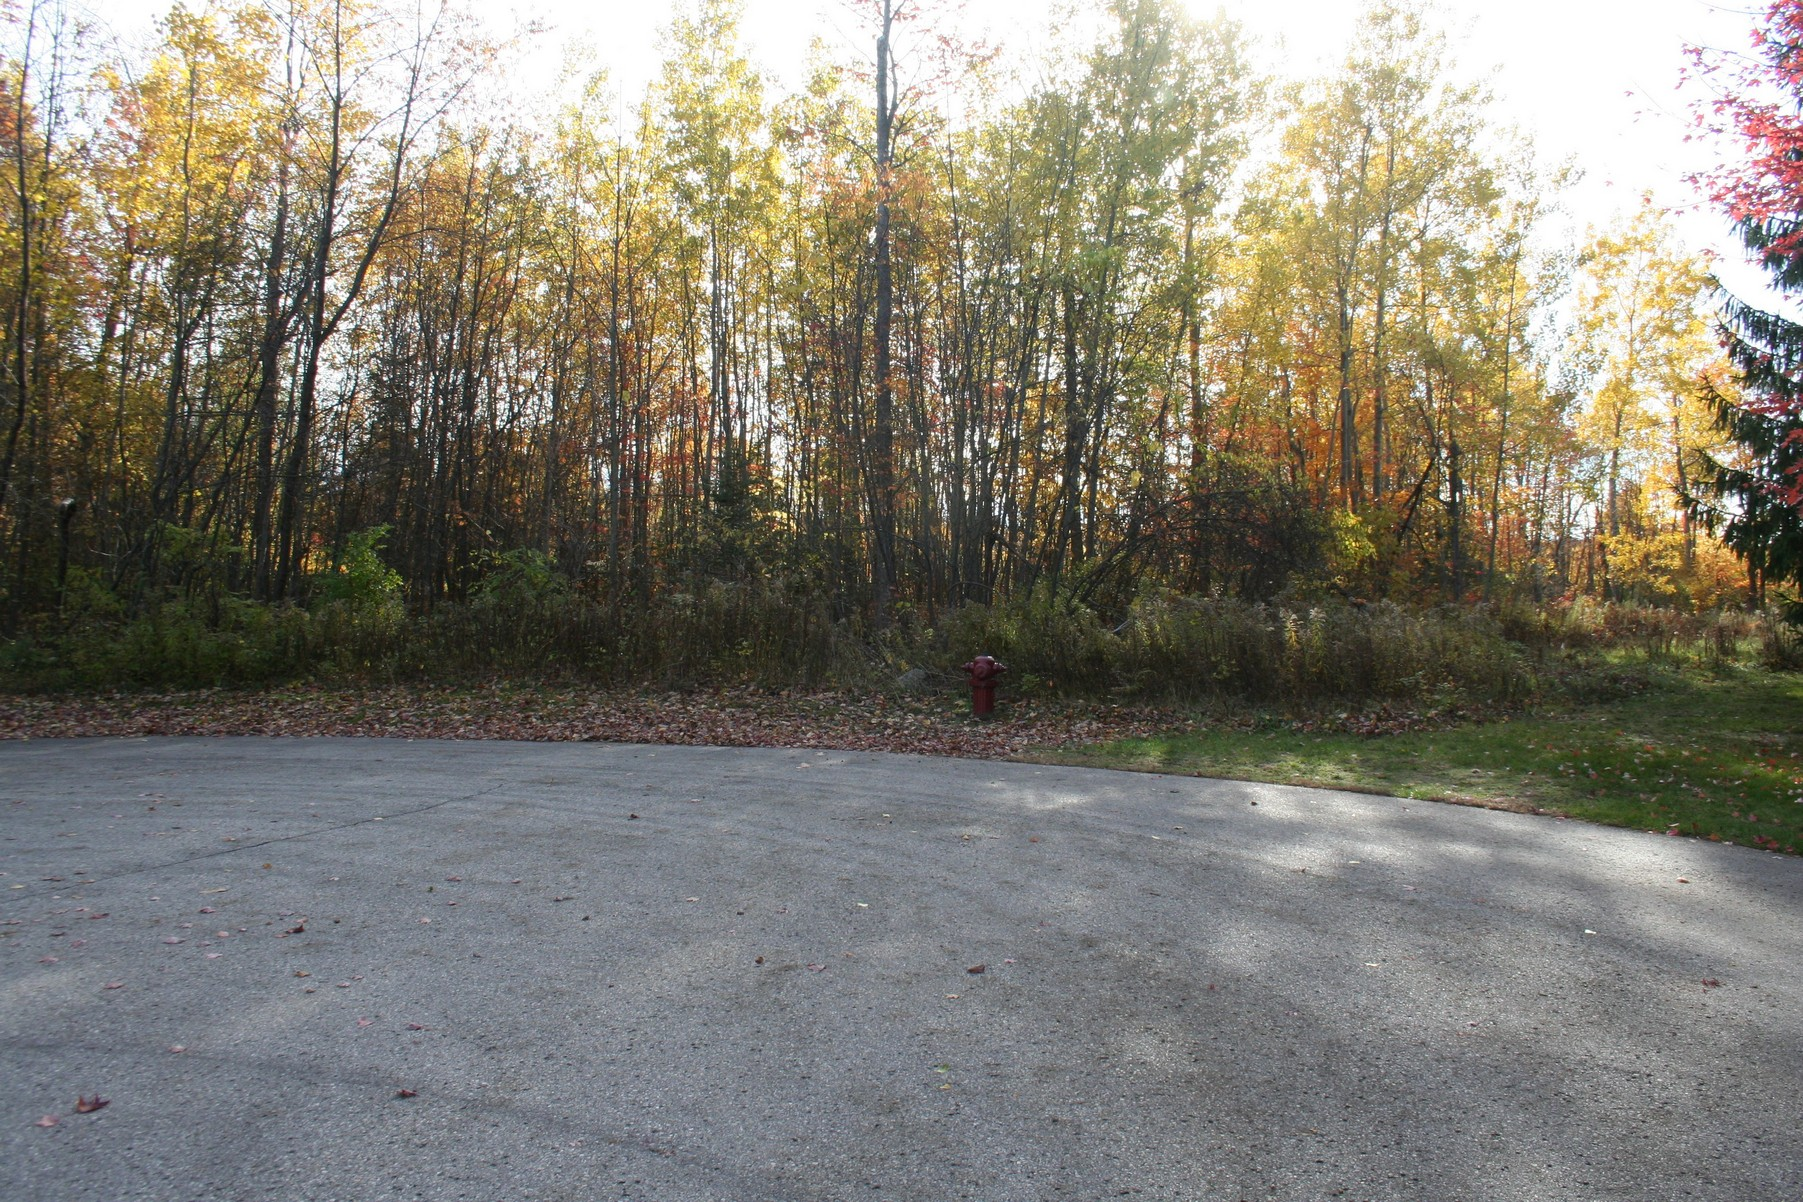 Land for Sale at Coastal Cliffs 15 6173 Coastal Cliffs Bay Harbor, Michigan, 49770 United States